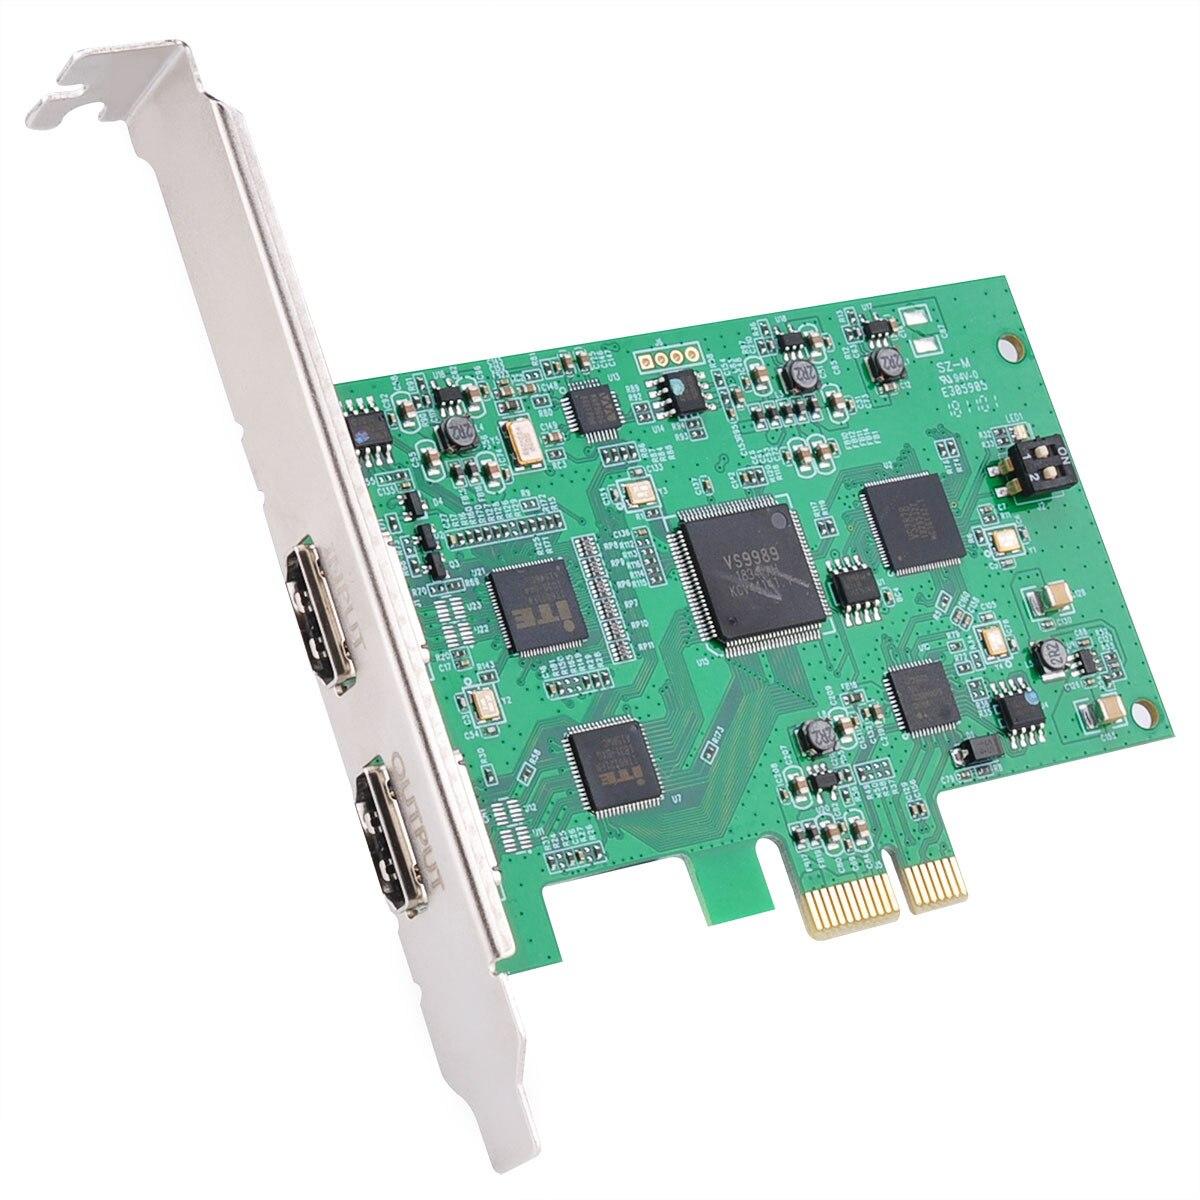 4k 1080P HD EZCAP 294 caja de tarjeta de captura de vídeo para OBS transmisión en directo por Internet para Windows para Xbox PS4 juego grabadora/Reunión